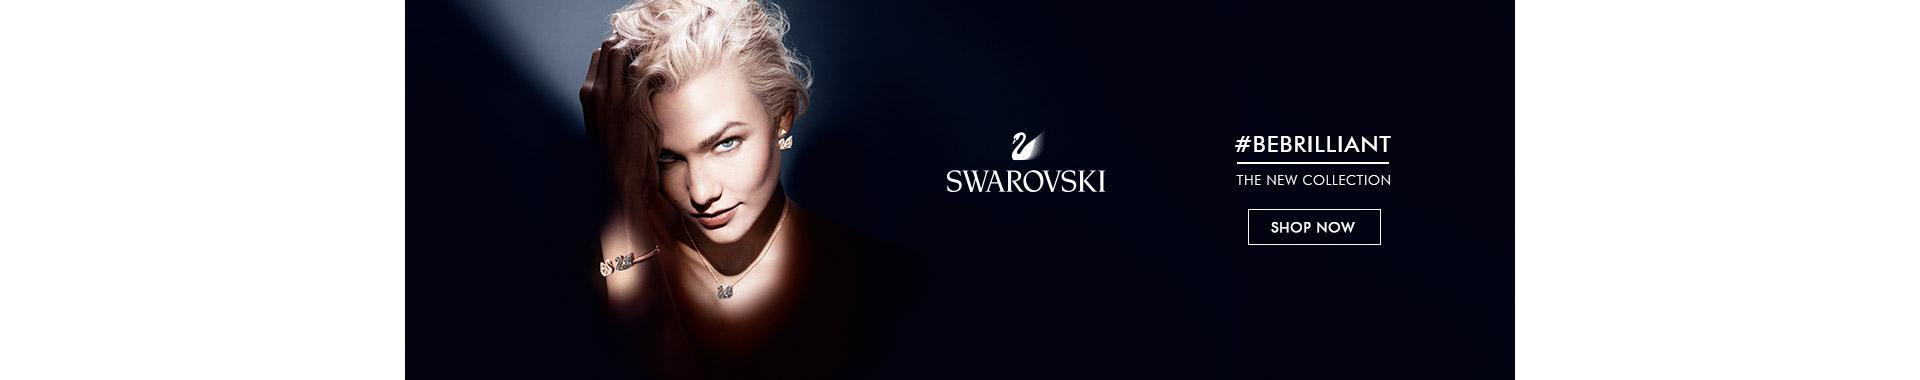 Swarovski SS18 Neutral Collection